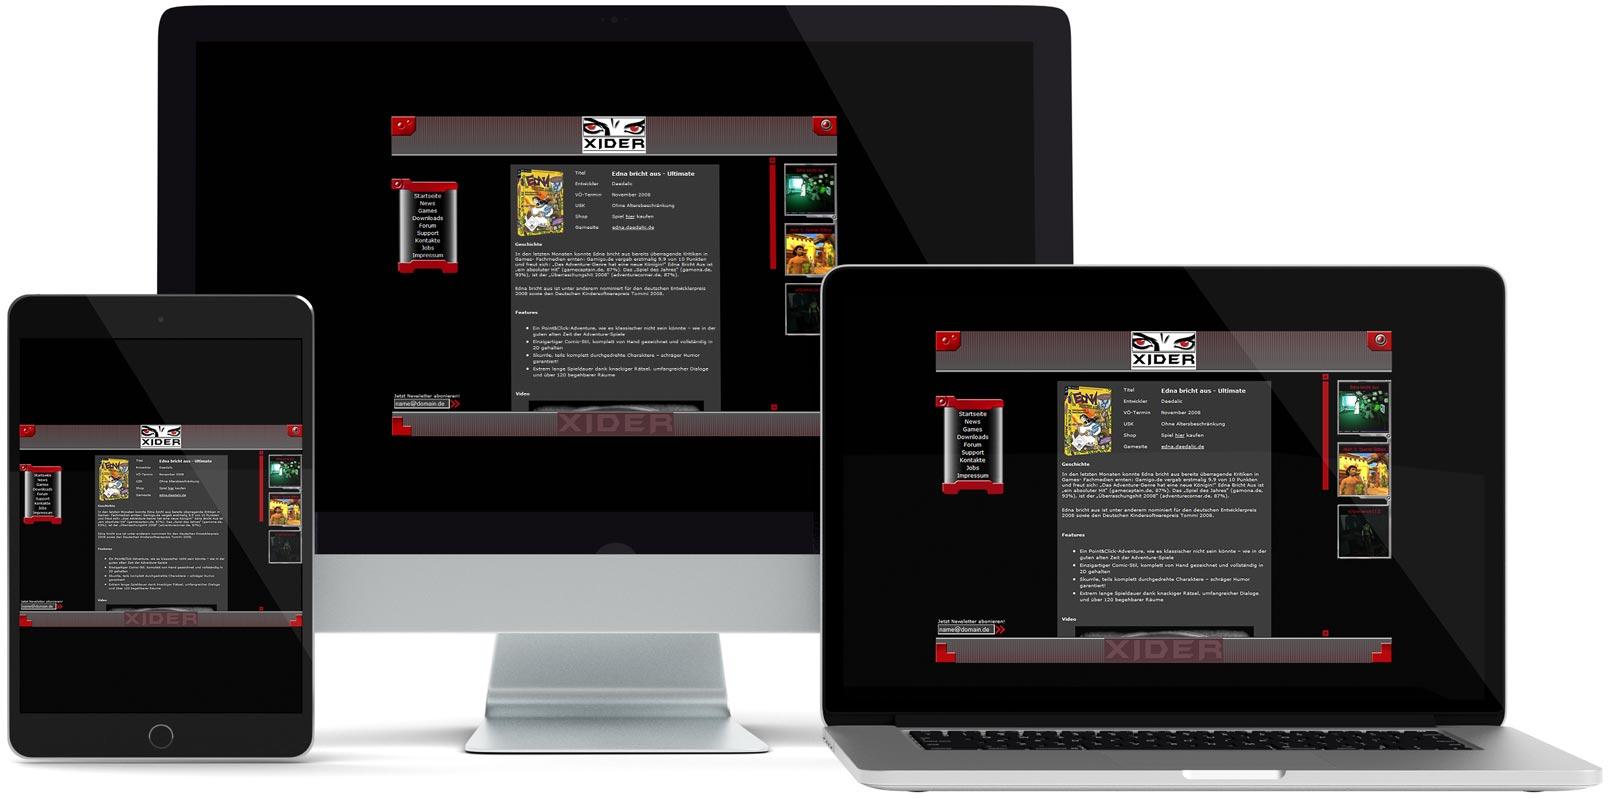 Dreamweaver Webdesign: XIDER